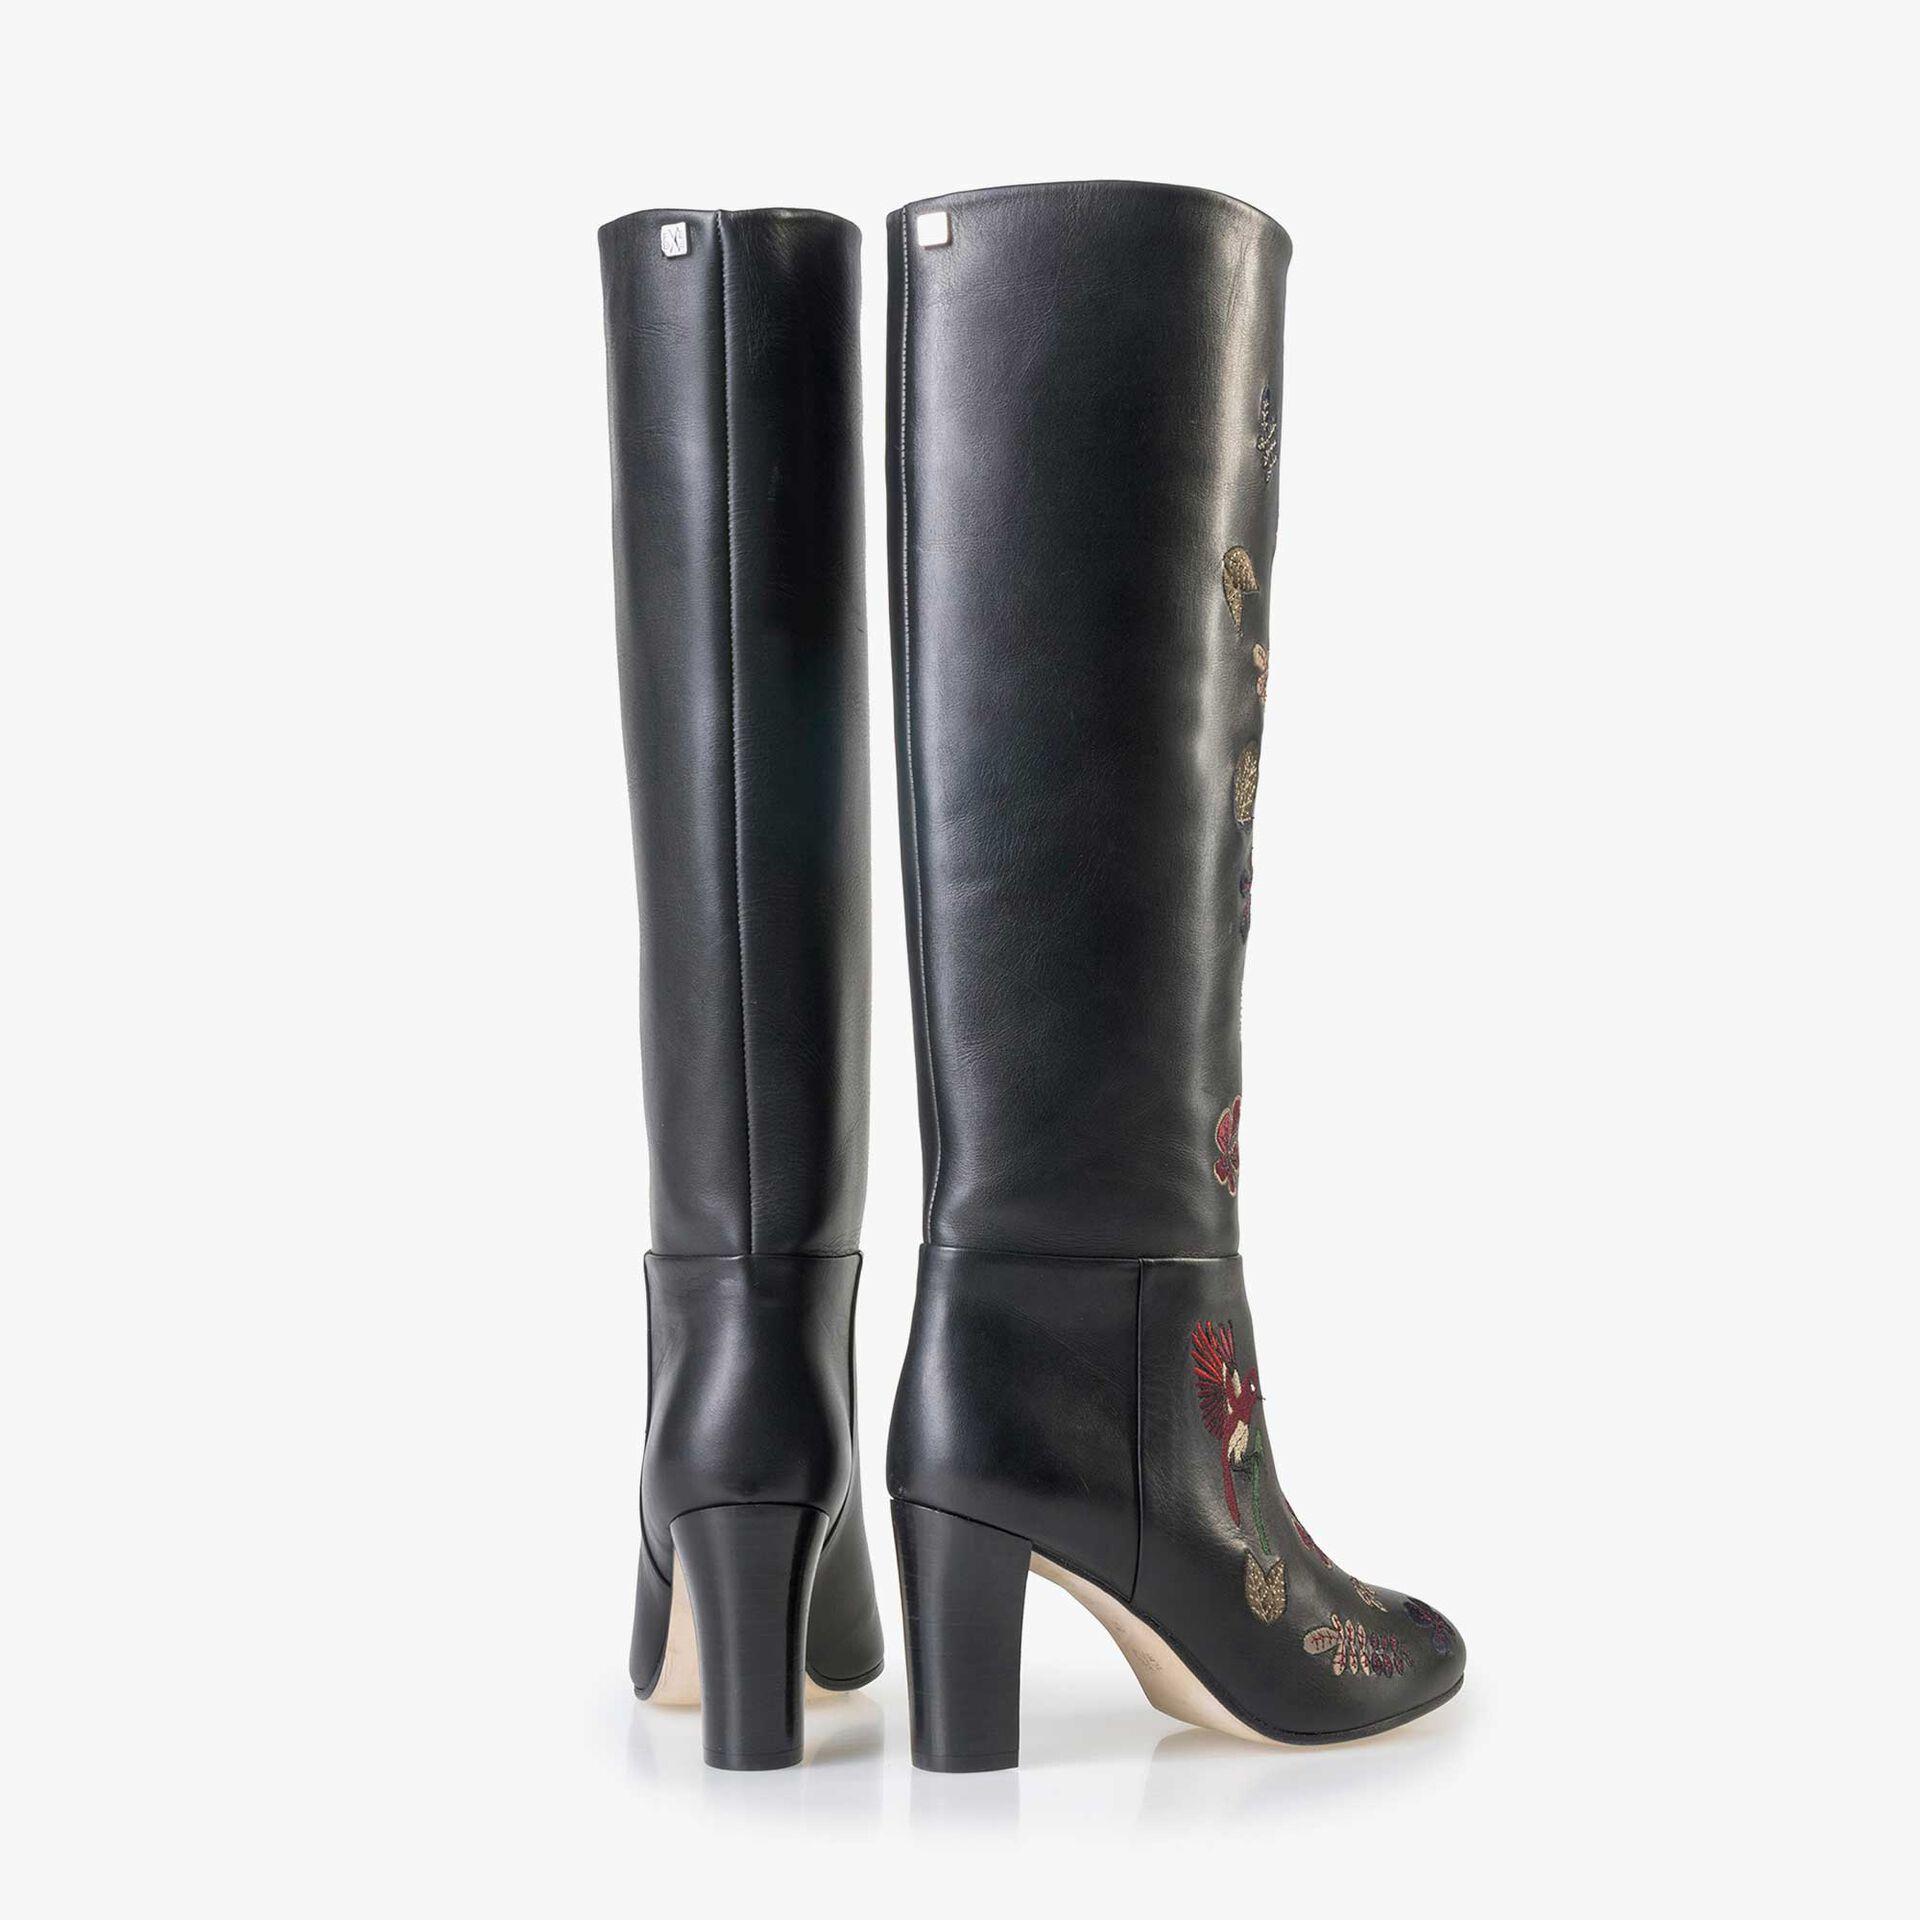 Floris van Bommel schwarze Damen Leder Stiefel